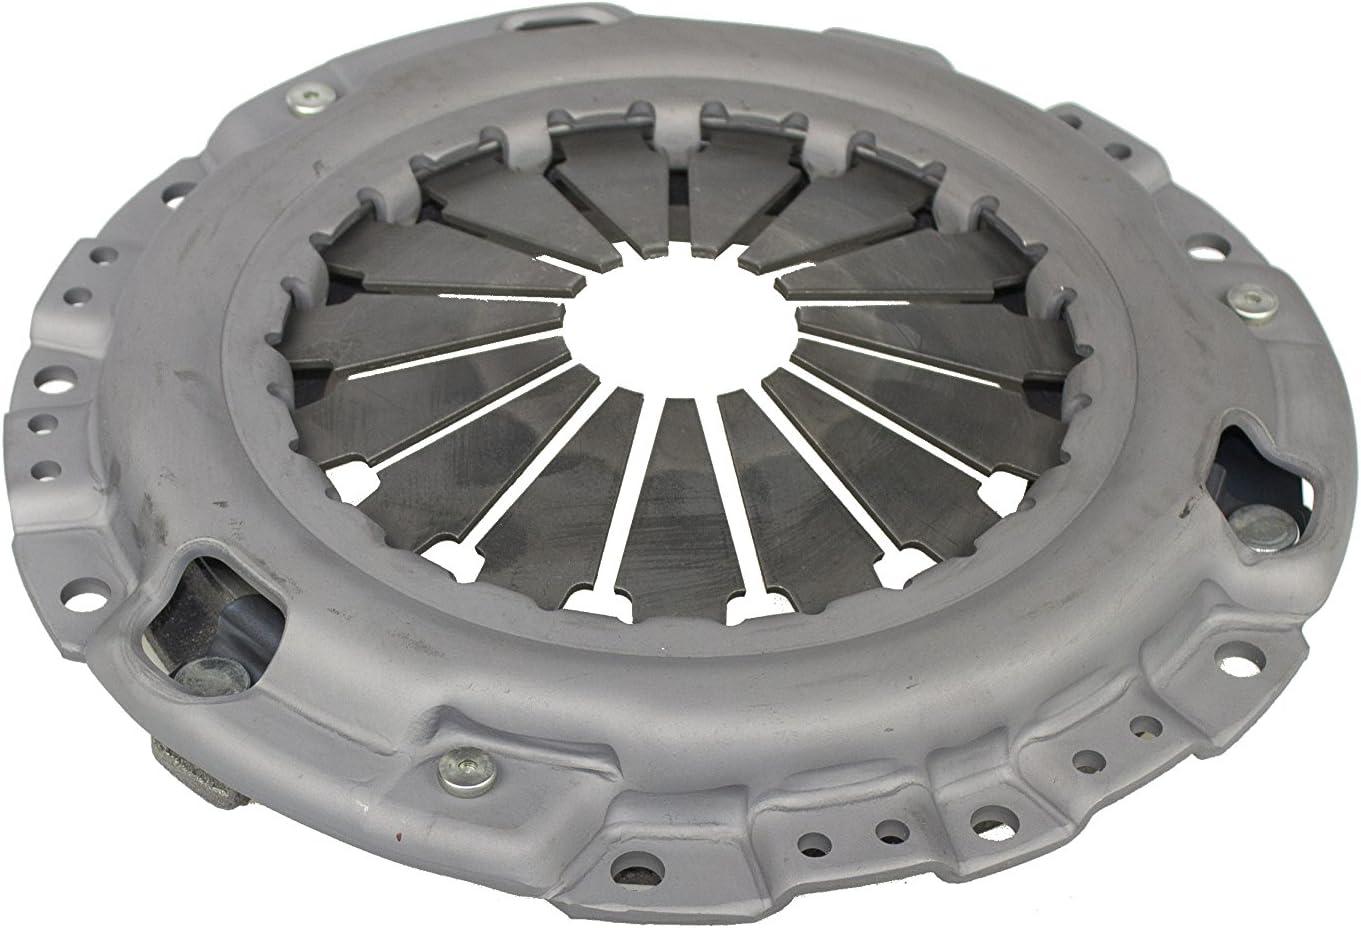 Flywheel Spec: -0.61; Clutch Kit Compatible With Eclipse Expo 3000Gt Colt R//T Sxt Lx Spyder Gs S Se Sport 4x4 1990-2005 2.0L l4 GAS DOHC Turbo 3.0L V6 GAS DOHC Naturally Aspirated